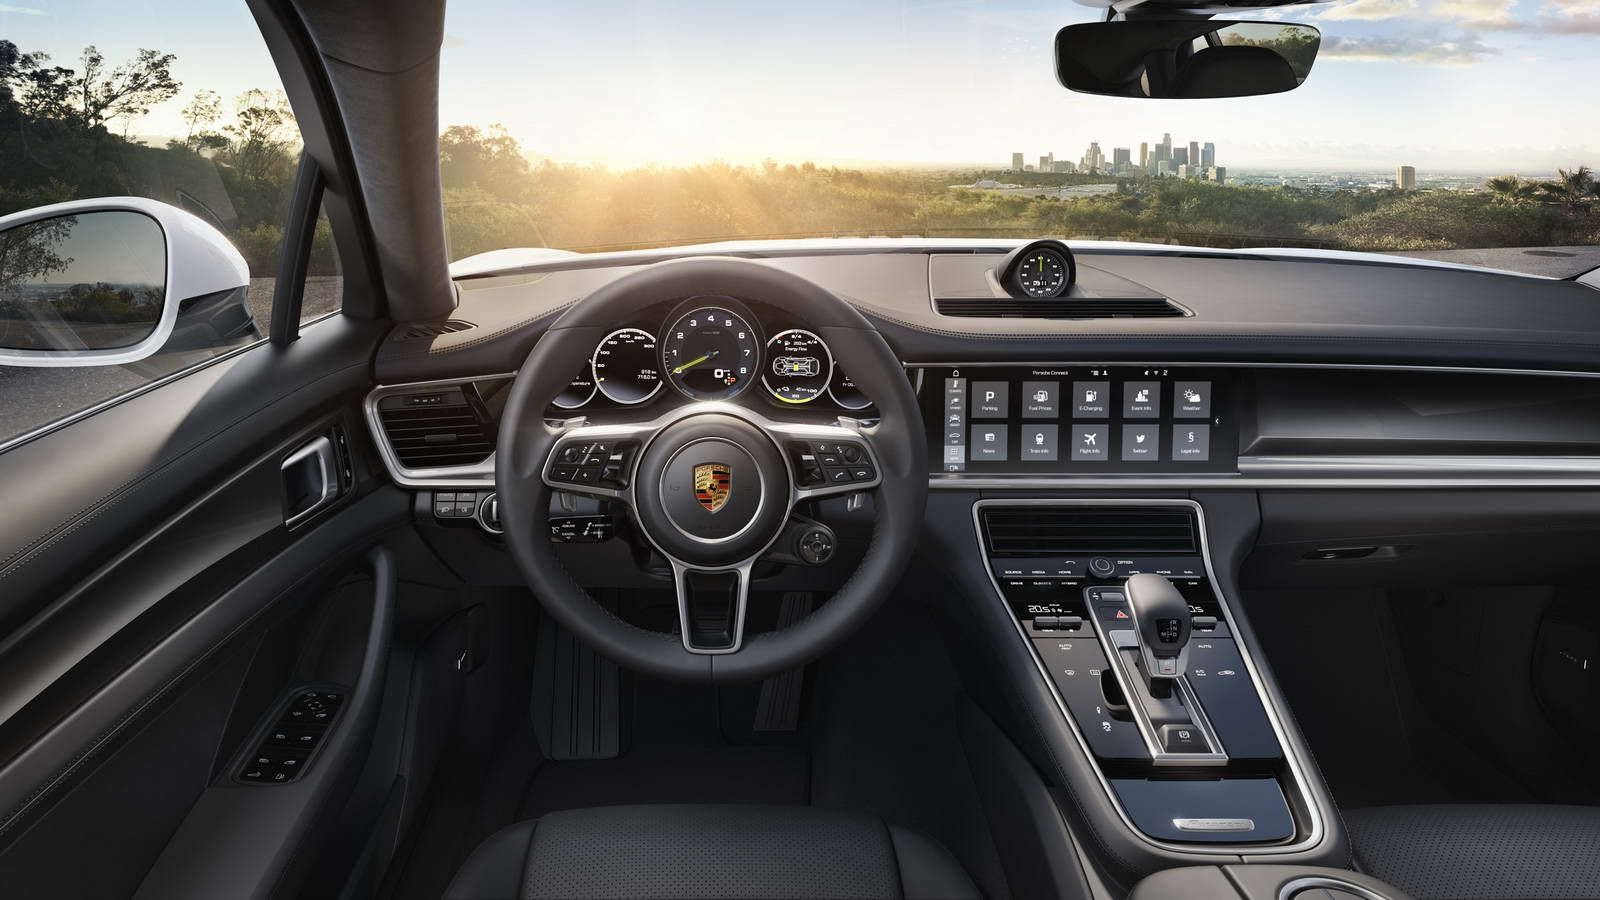 2017 Porsche Panamera 4 E Hybrid The 462 Hp Output Is Not A Surprise But The Official Average C Porsche Panamera 4 Porsche Panamera Porsche Panamera Turbo